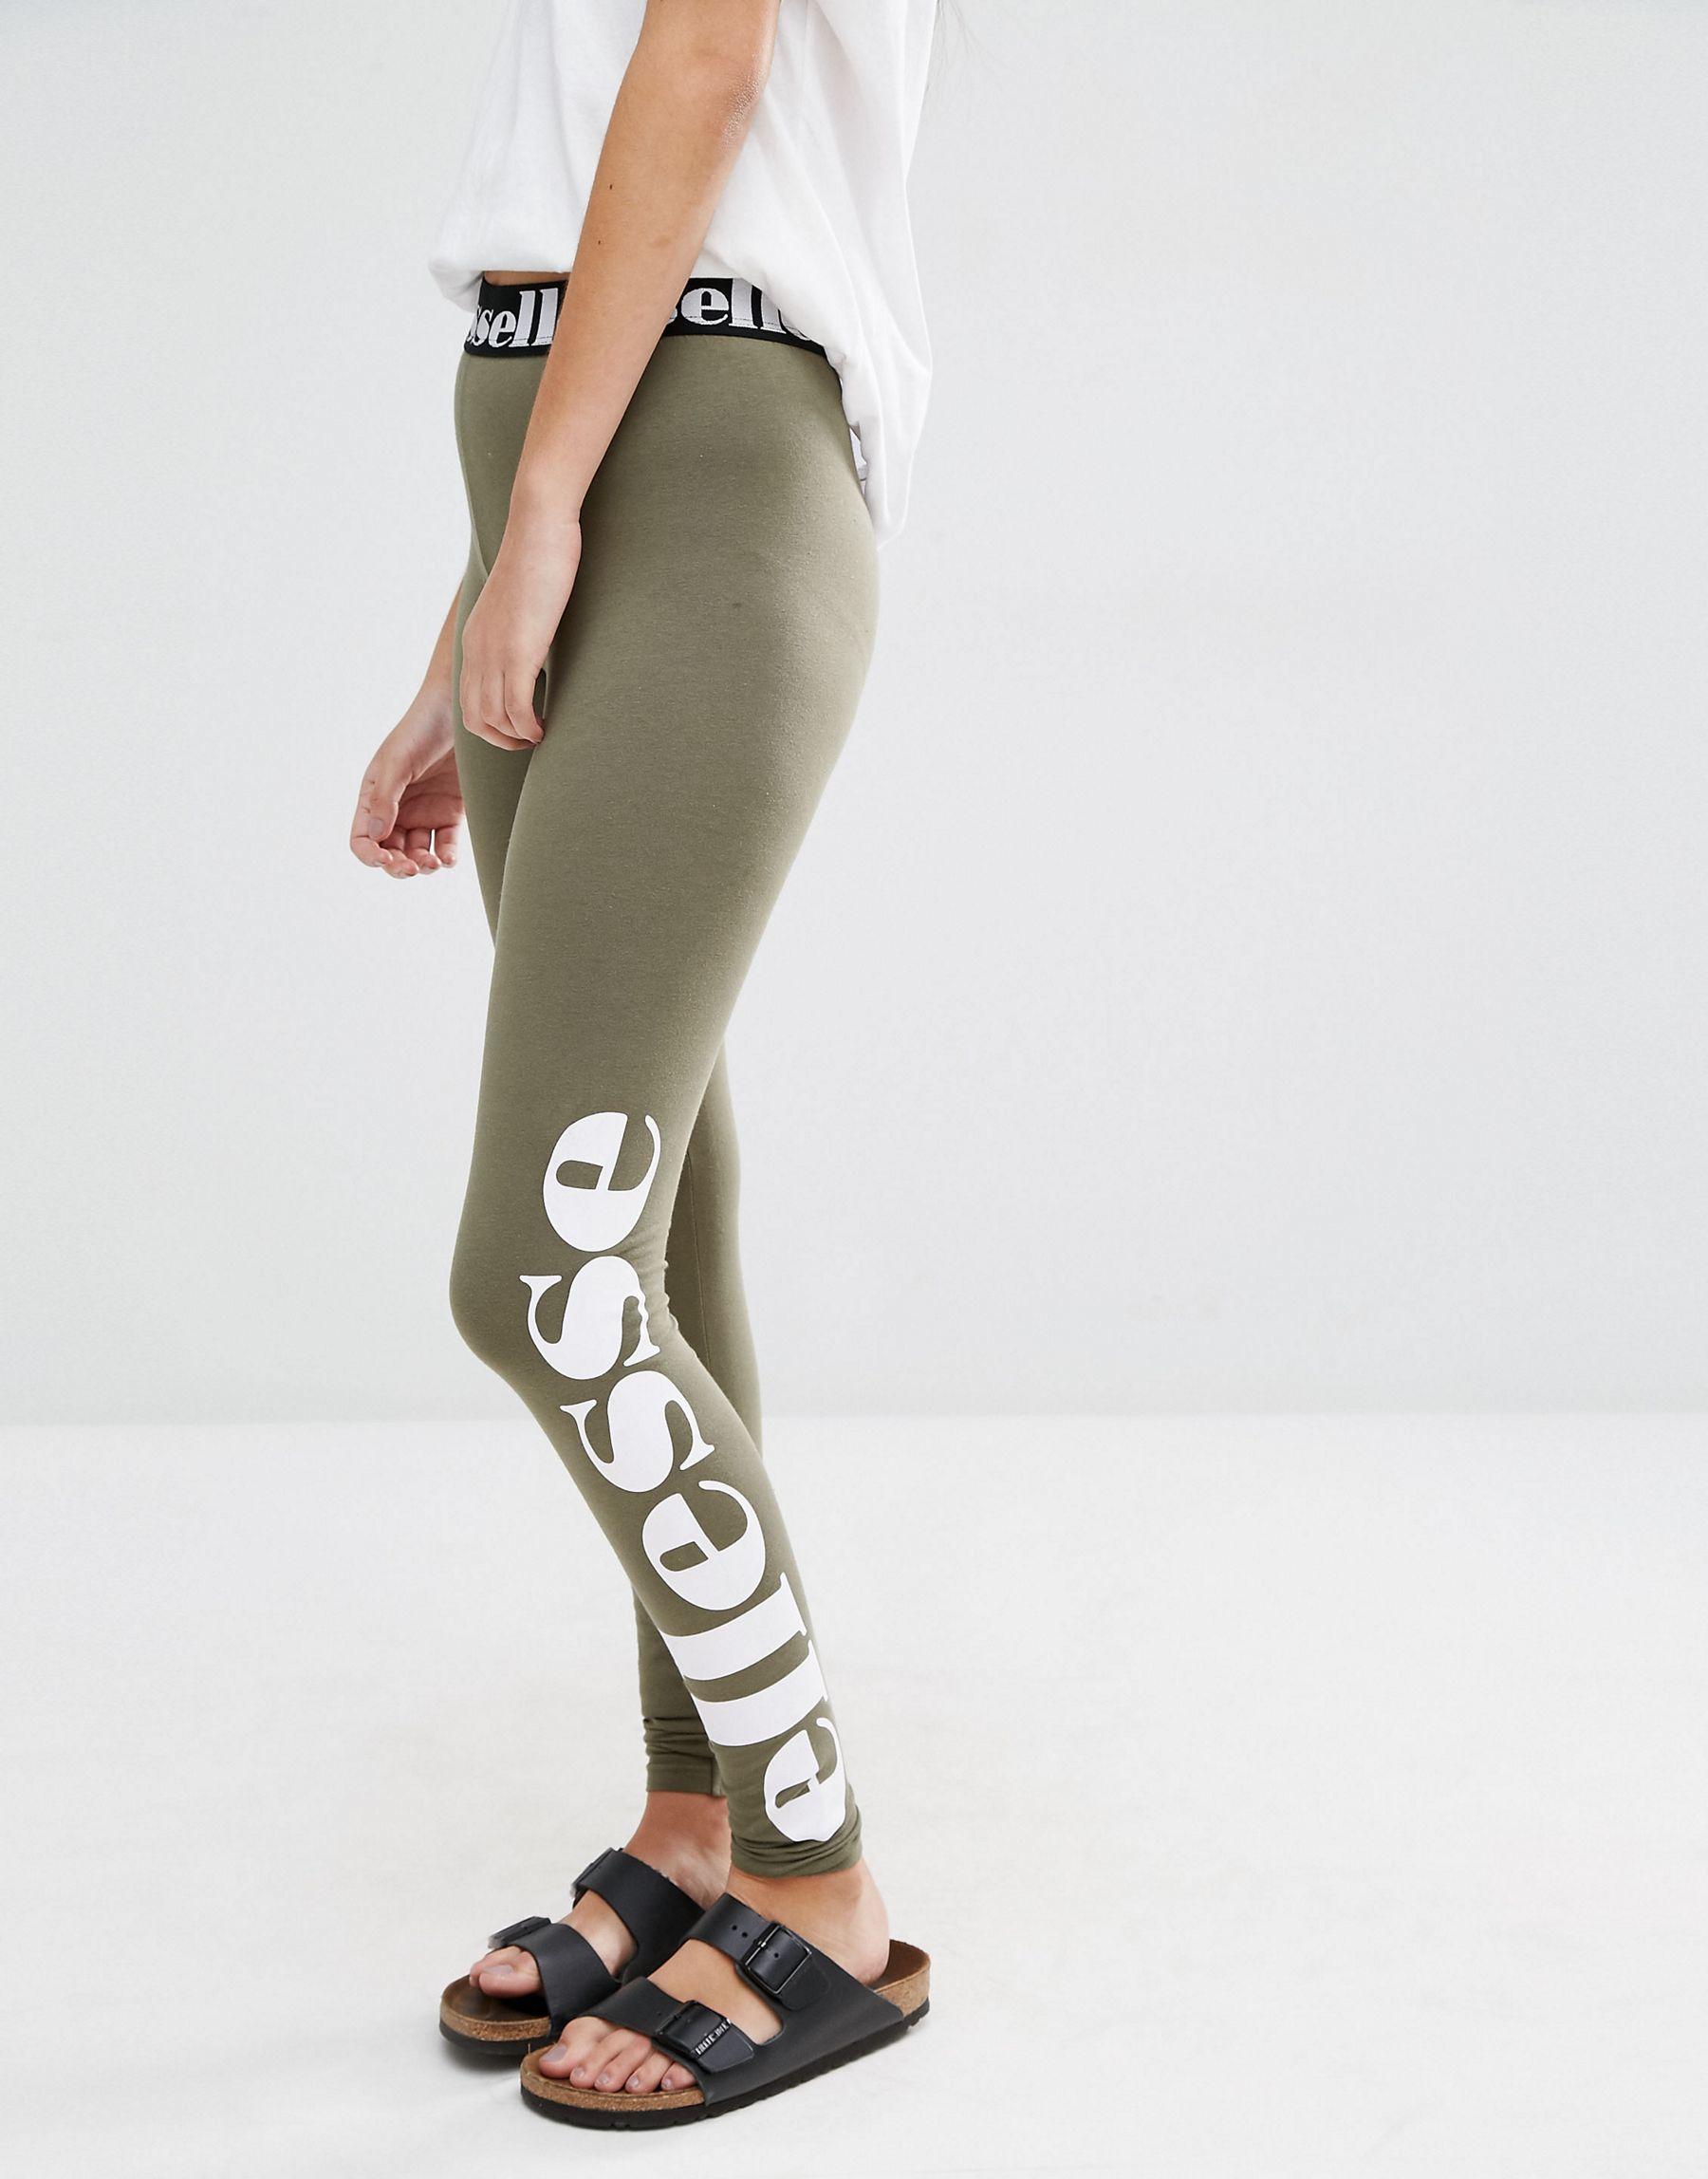 lyst ellesse leggings with side logo print